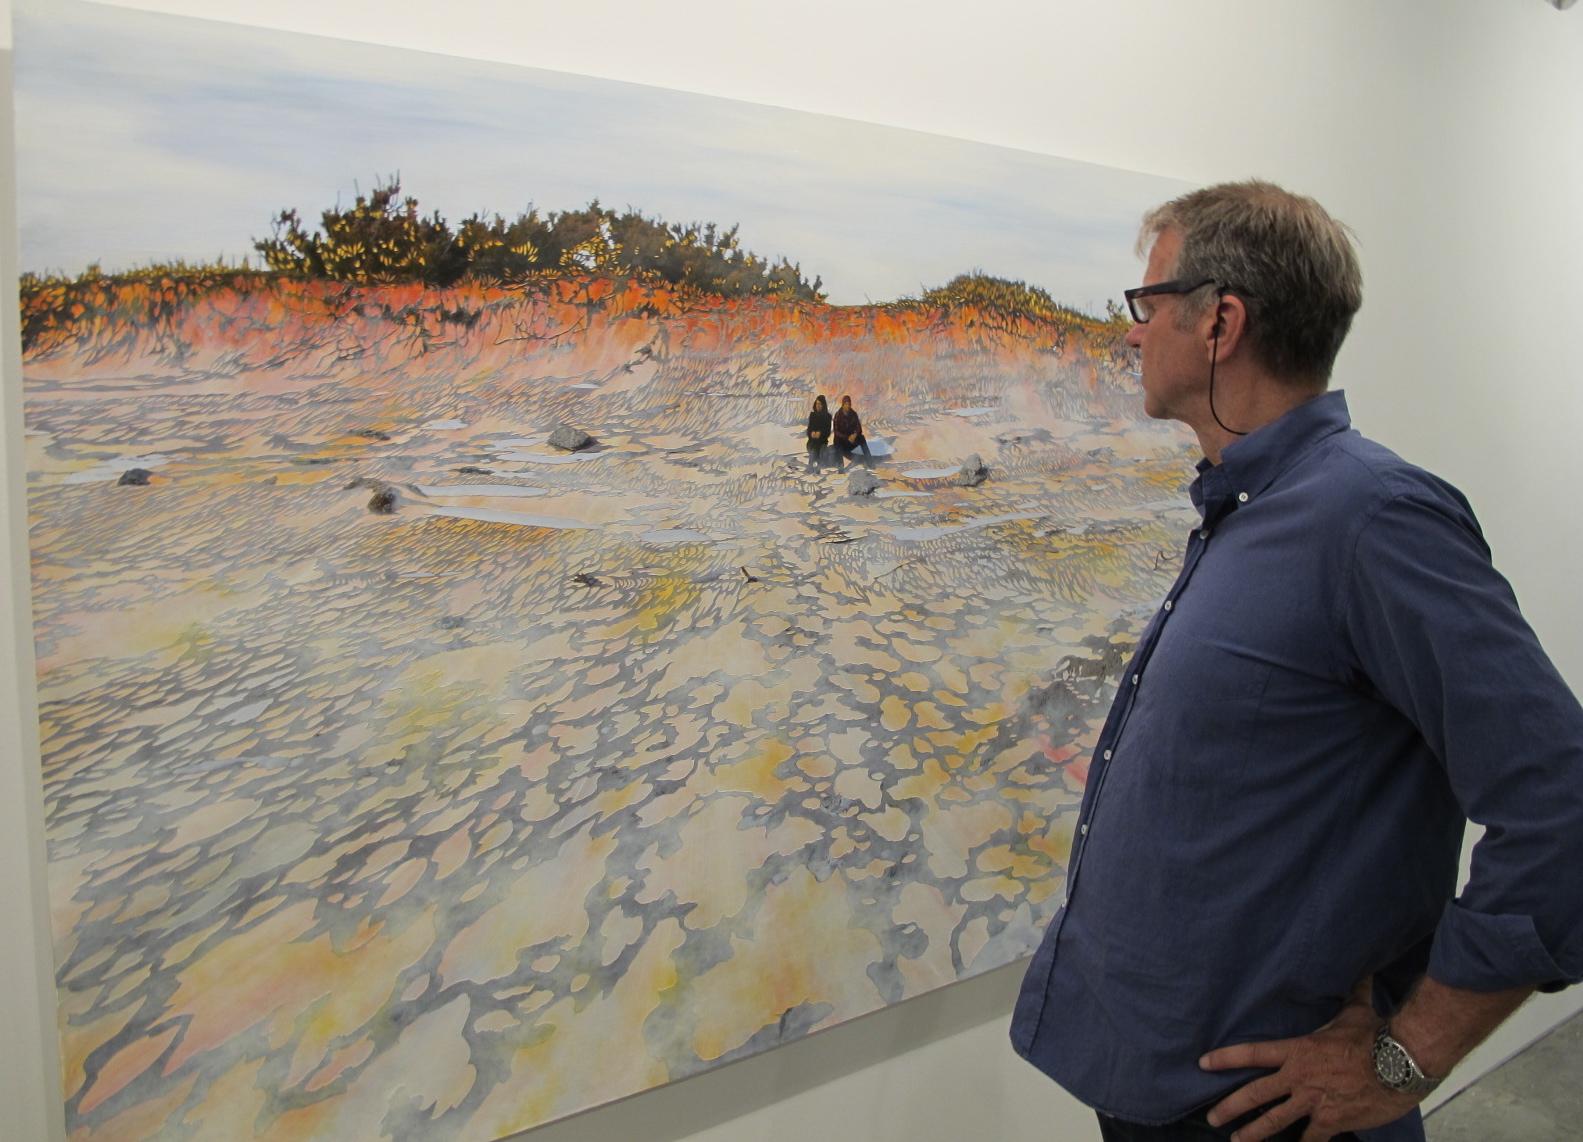 The work of Bradley Castellanos at Ryan Lee Gallery